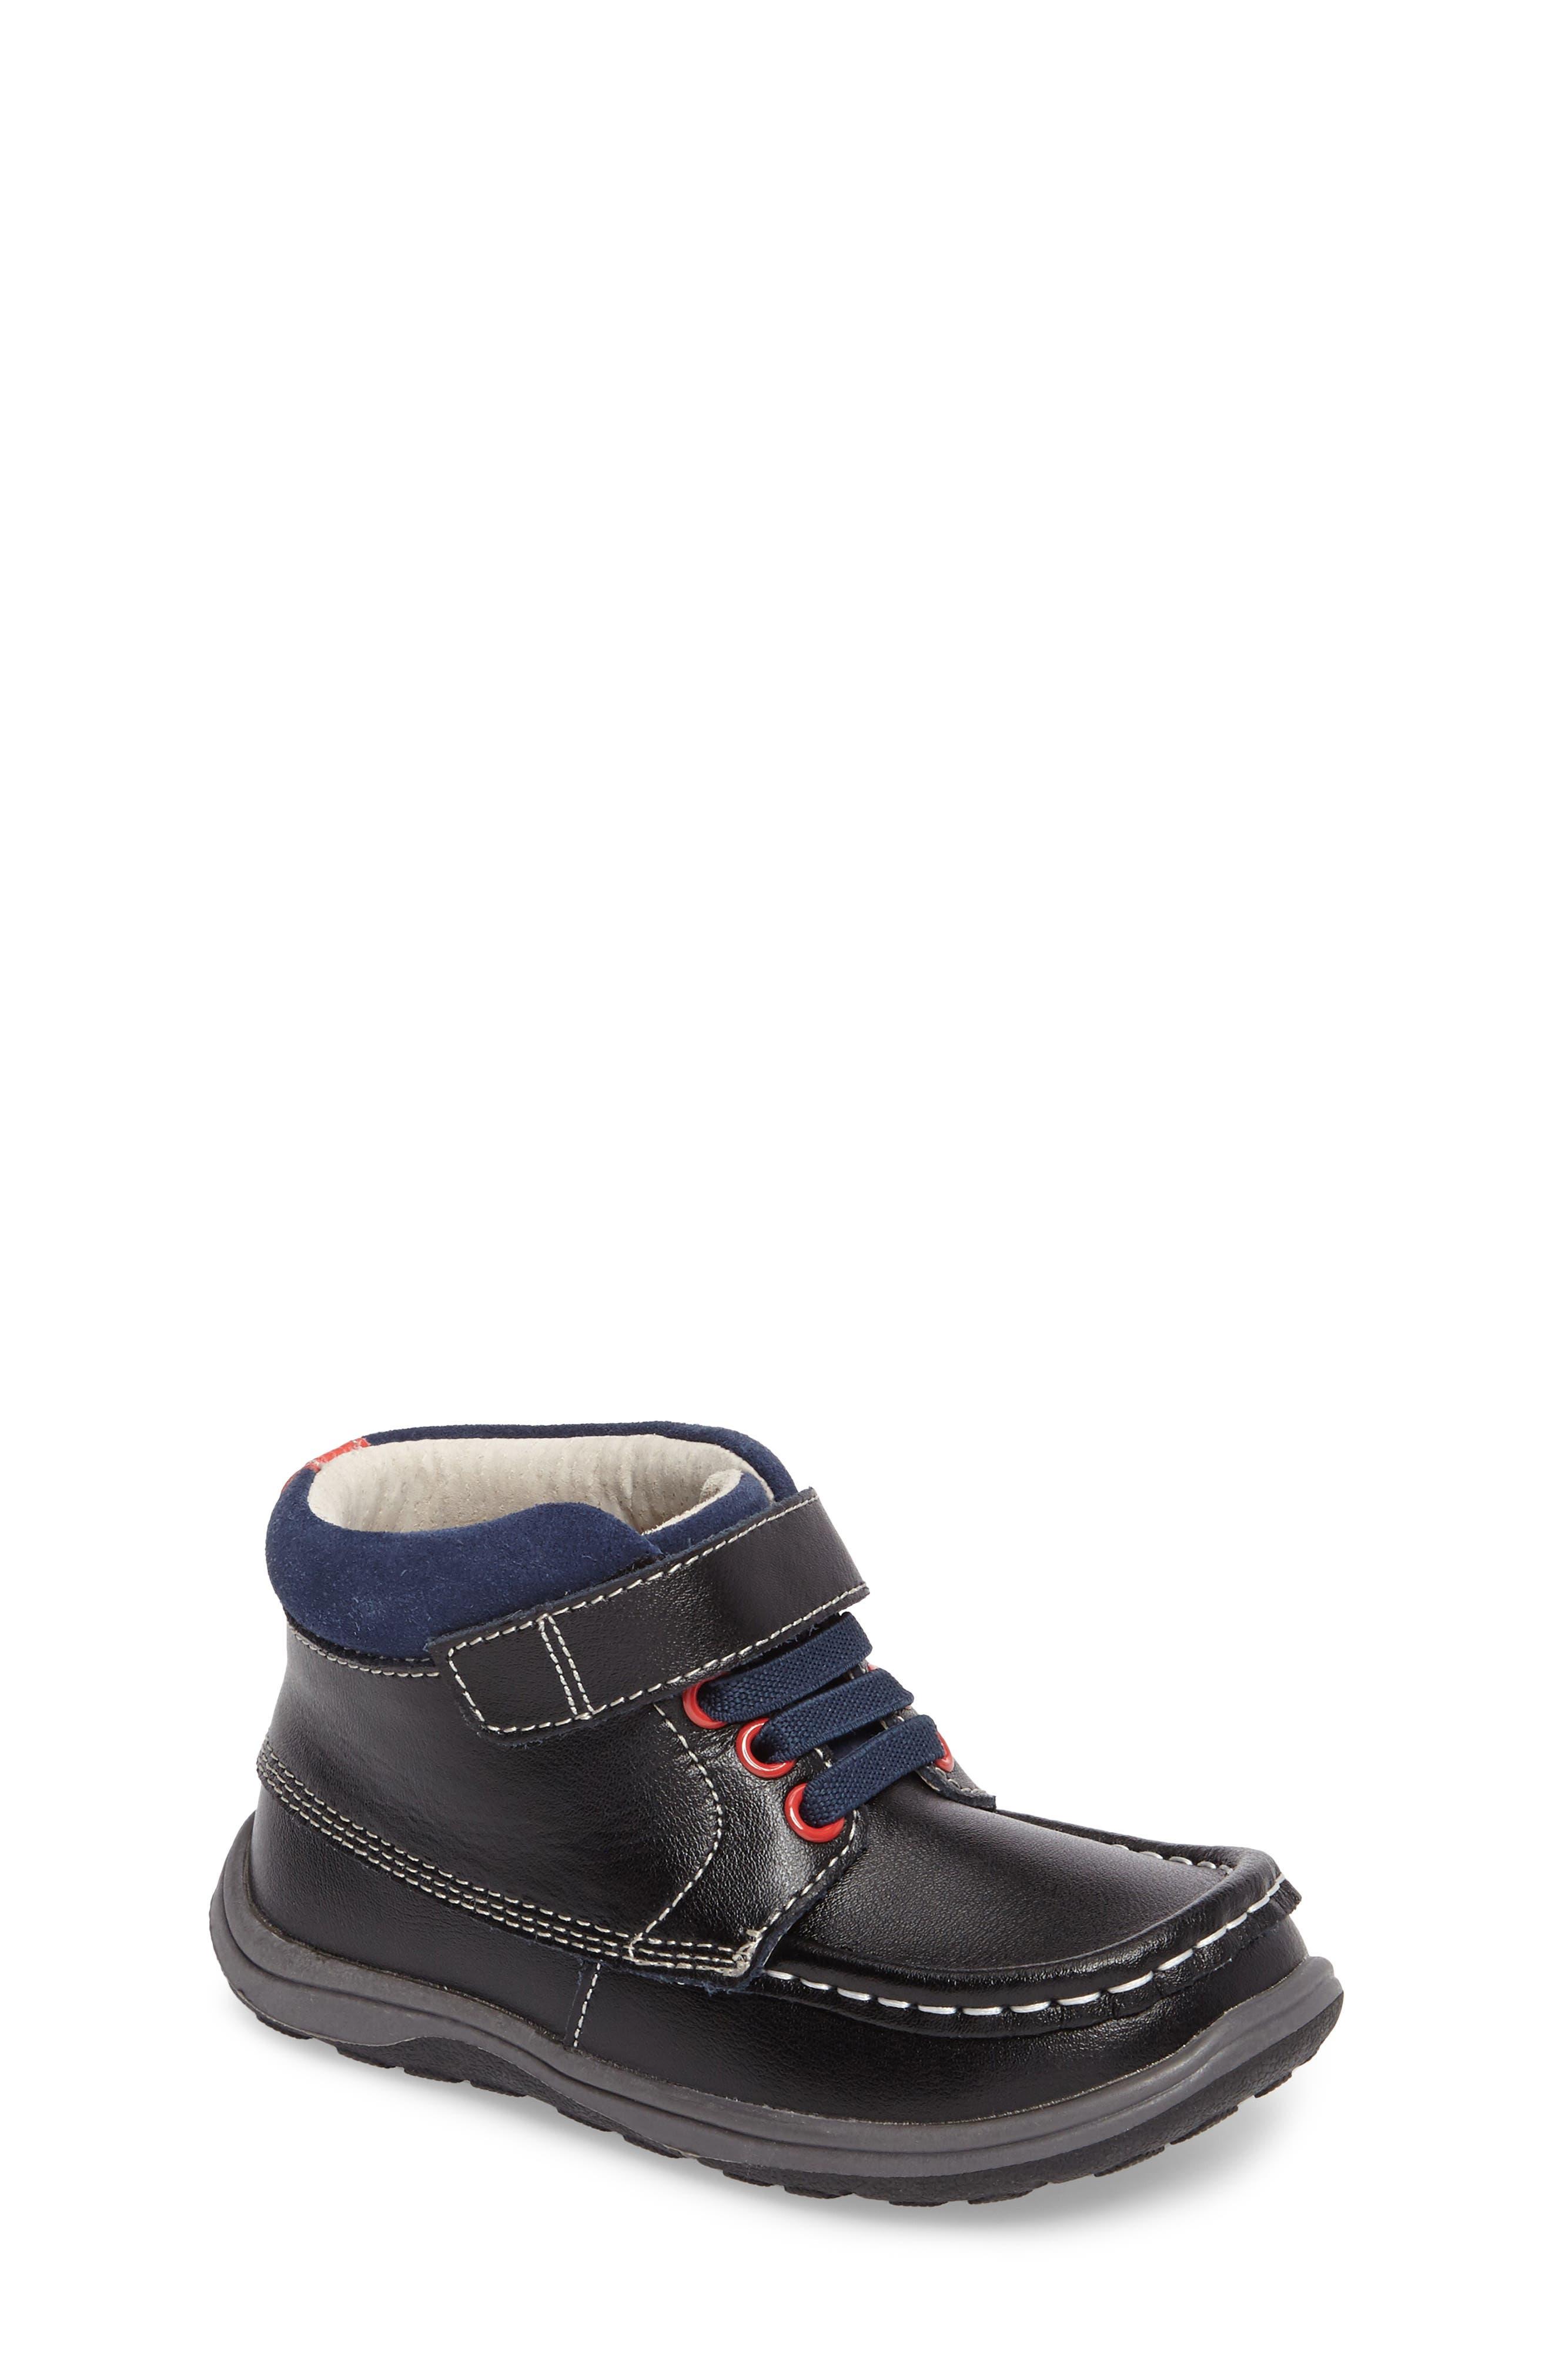 Main Image - See Kai Run Owen High Top Sneaker Bootie (Baby, Walker & Toddler)